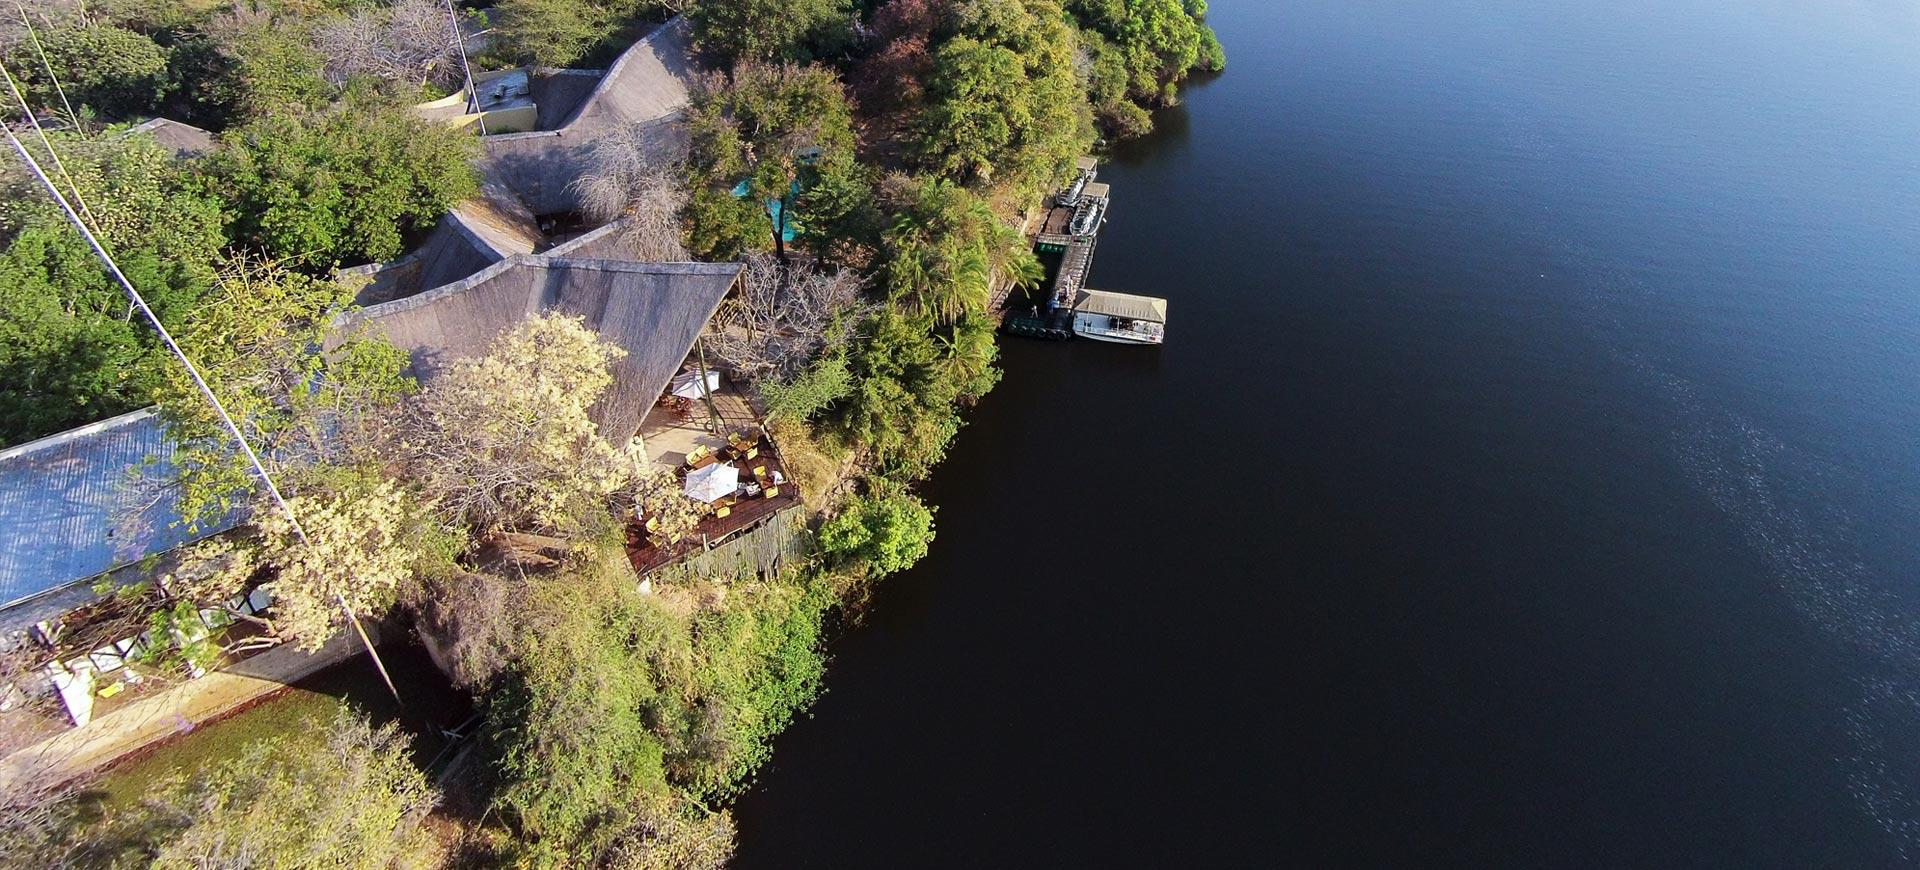 Chobe Safari Lodge Deck